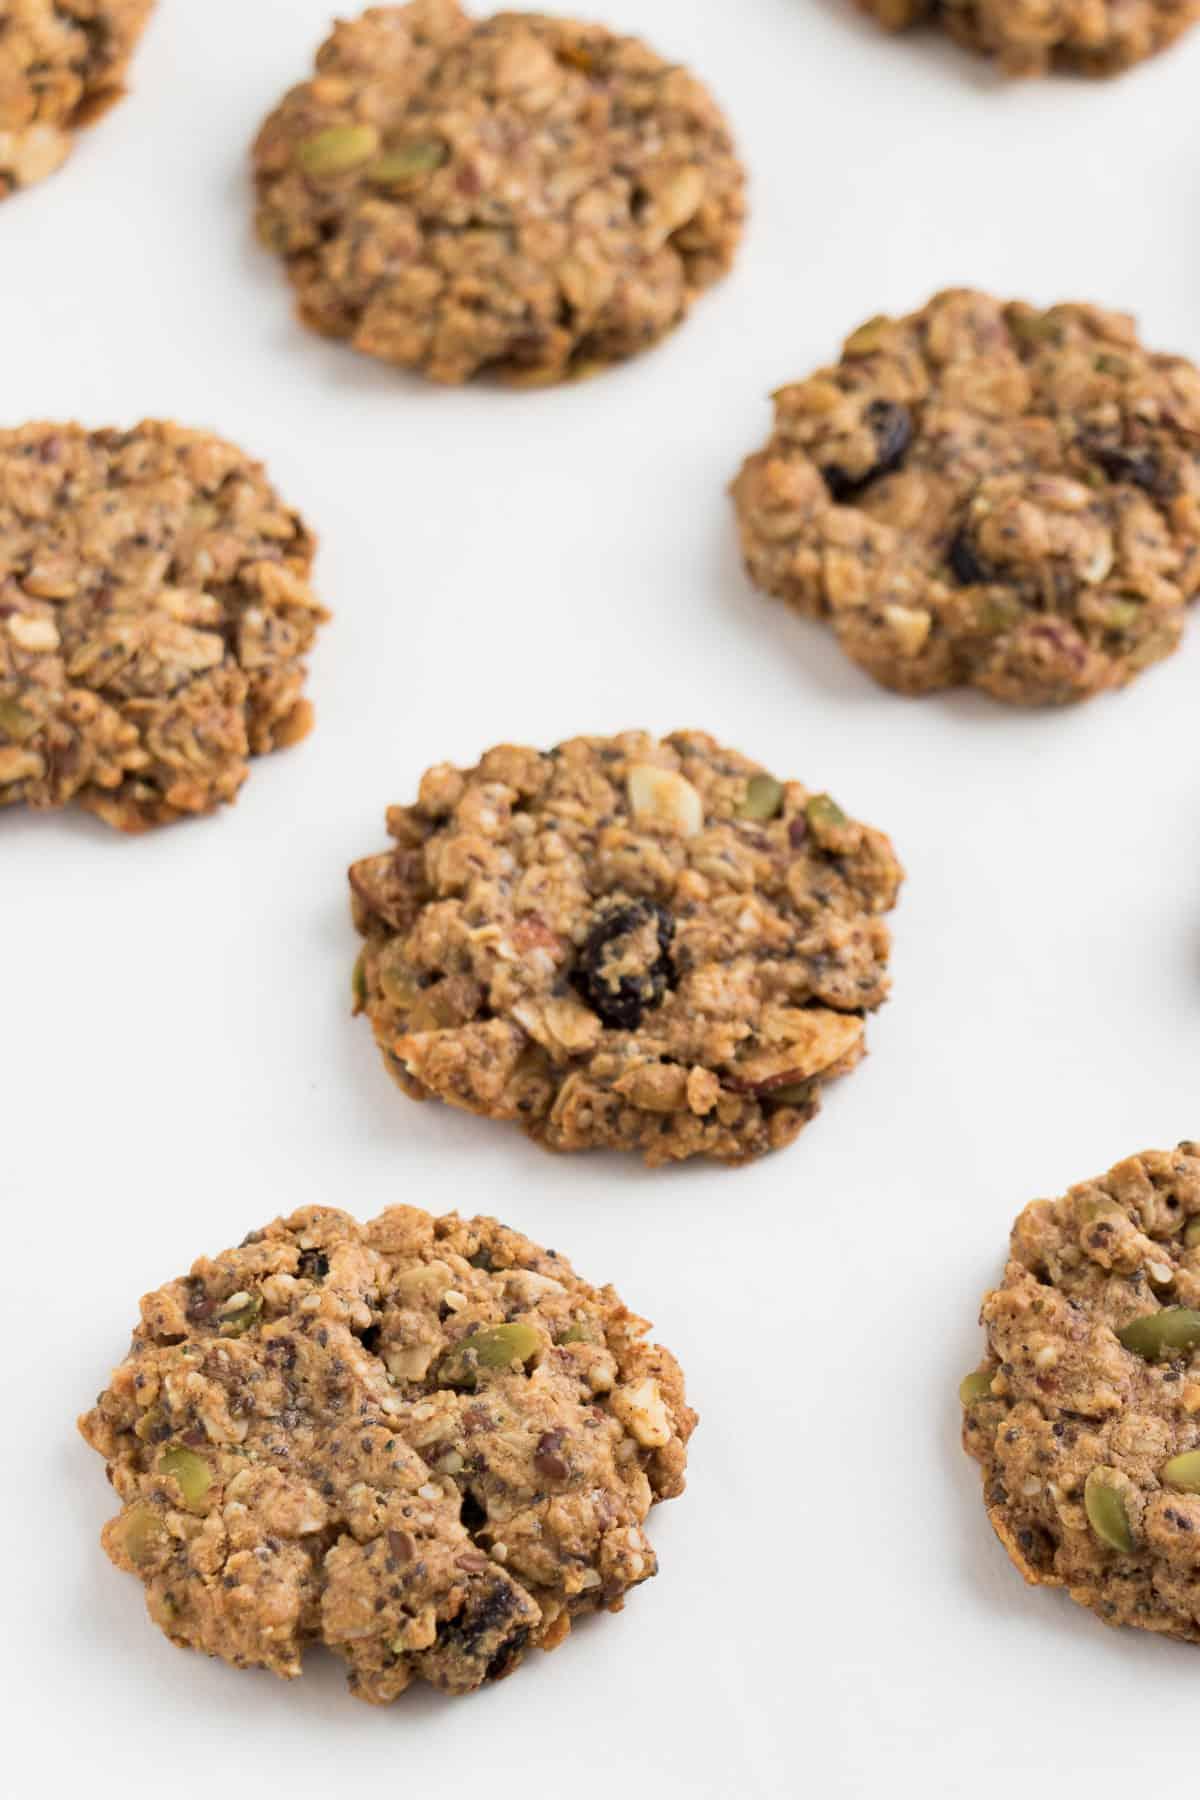 vegan superfood breakfast cookies on a white surface